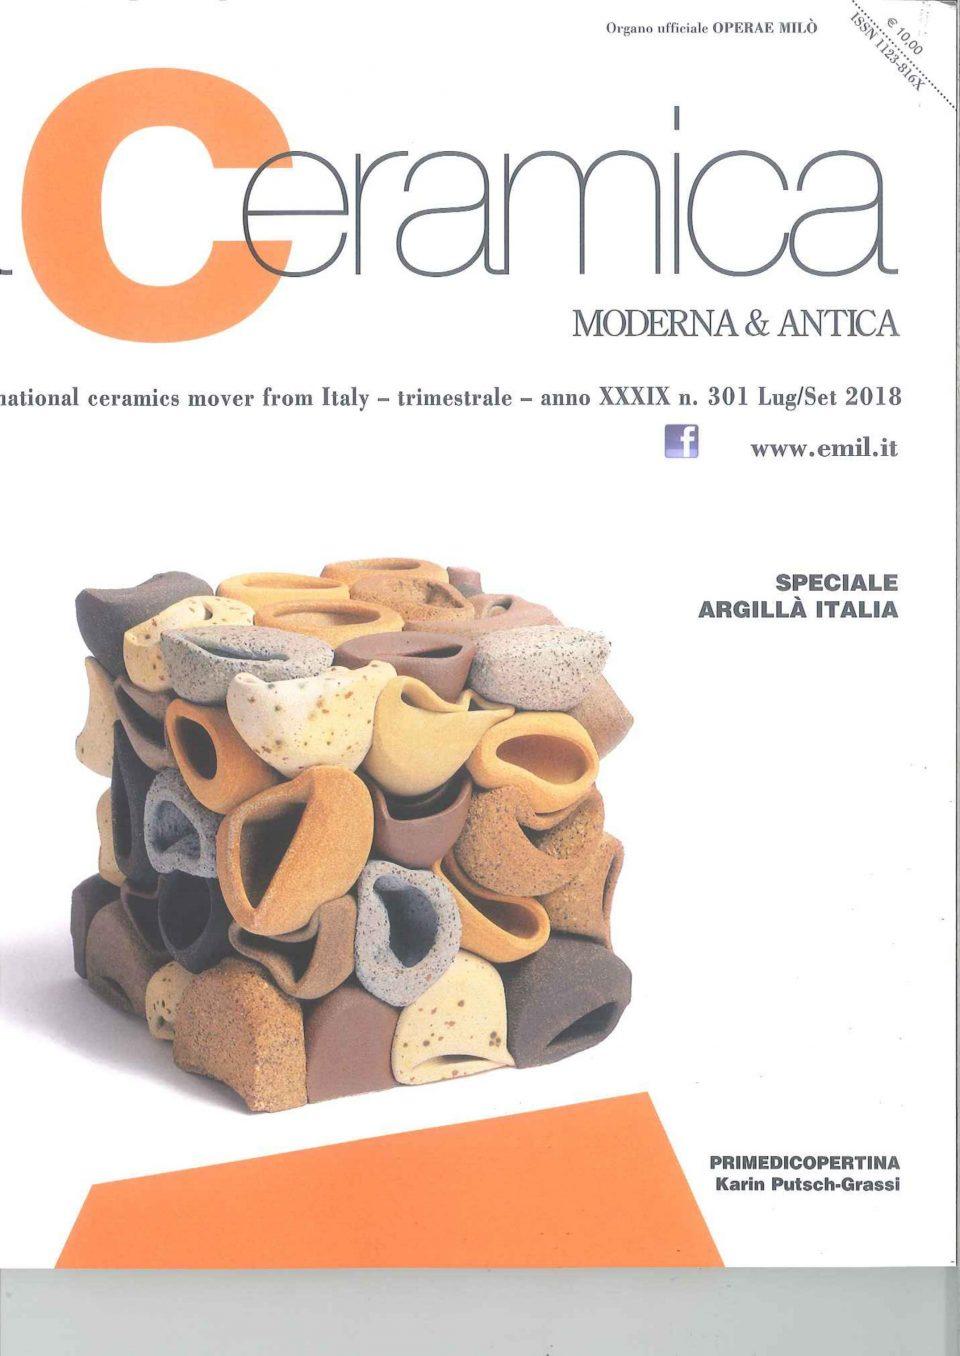 La Ceramica moderna & antica, The International ceramica mover from Italy - trimestrale - anno XXXIX n. 301 Lug/Set 2018